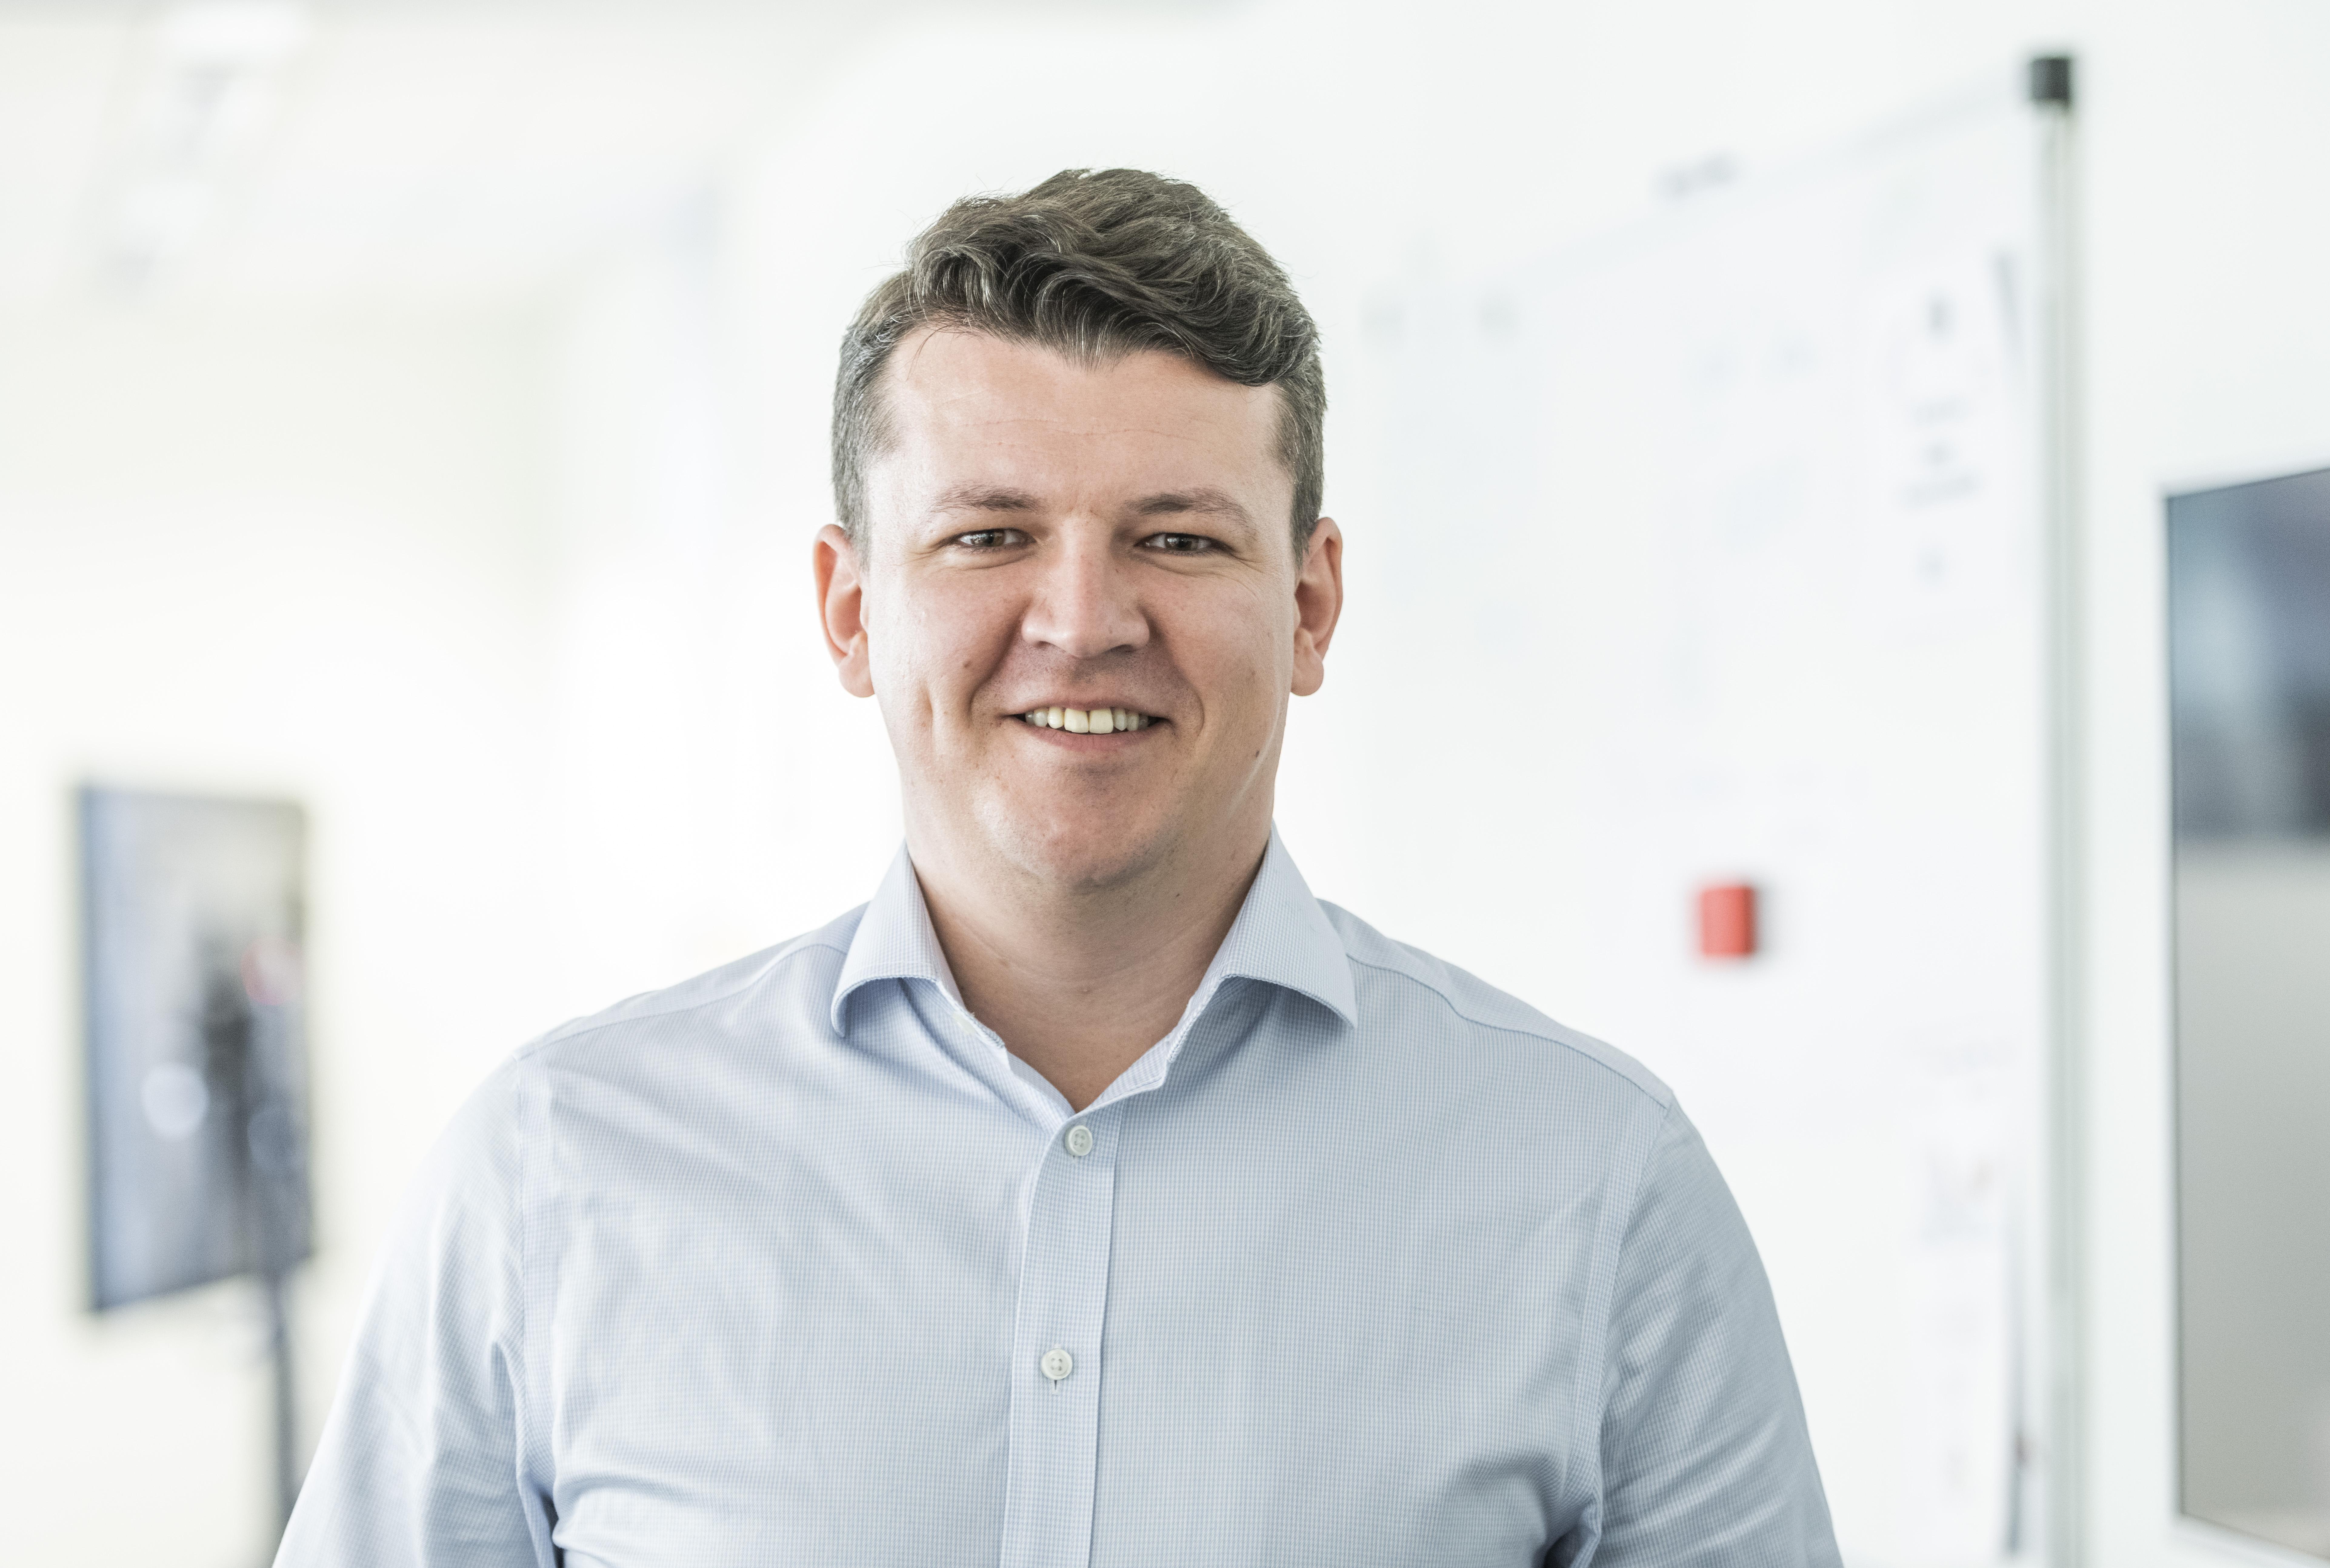 Erwin Förderer - Senior Firmenkundenbetreuer - Bayern Nord-Ost